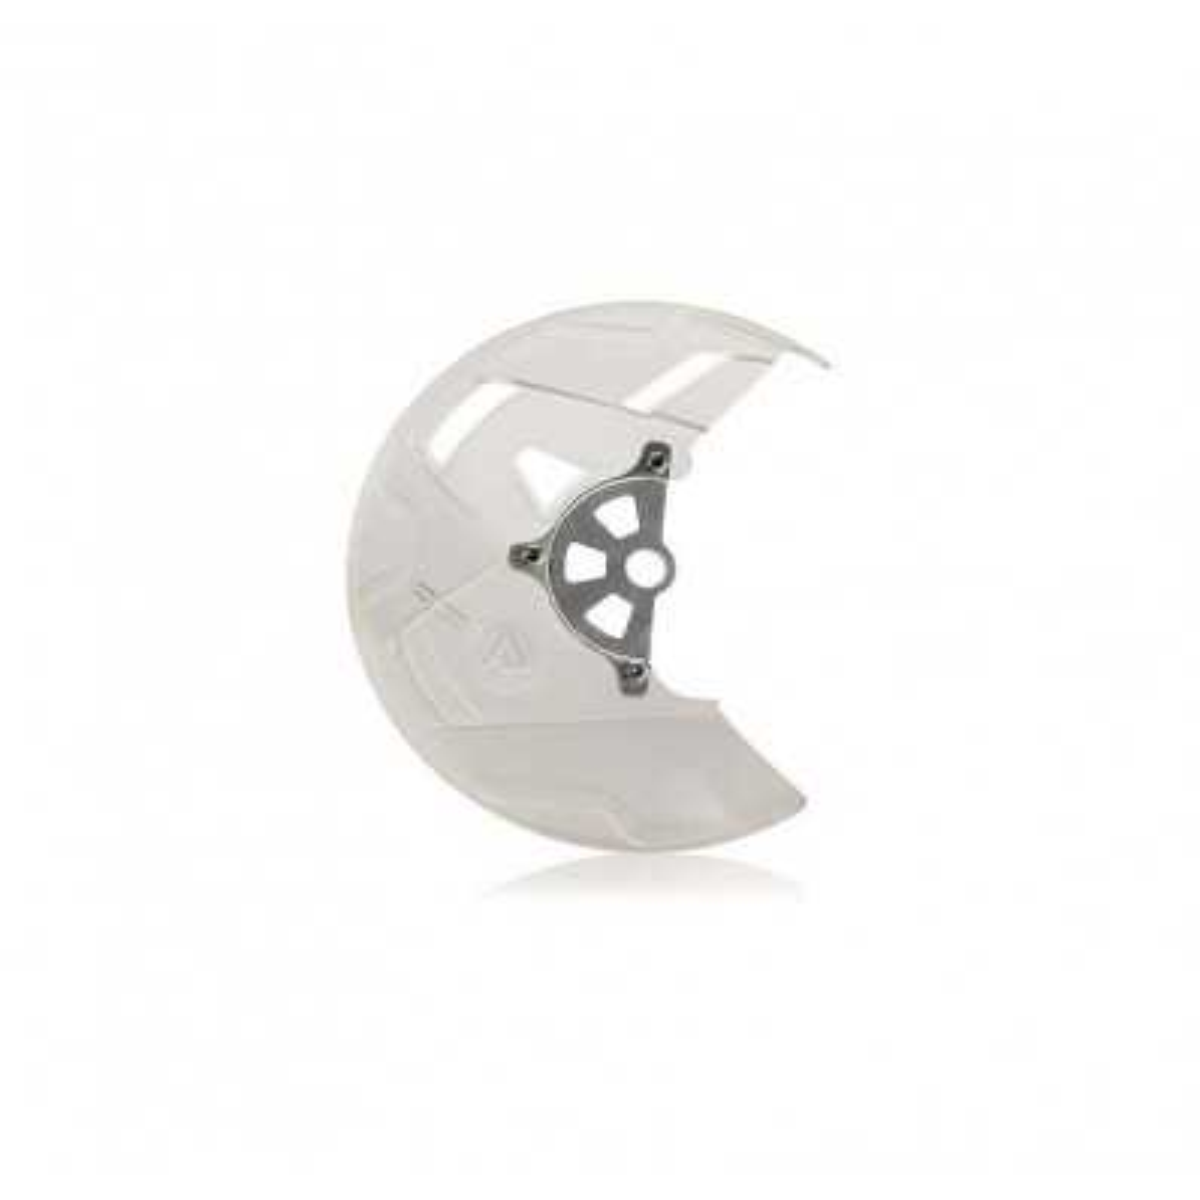 0021647-120 - Protector Disco Delantero Honda Xr400 07 16 Transparente